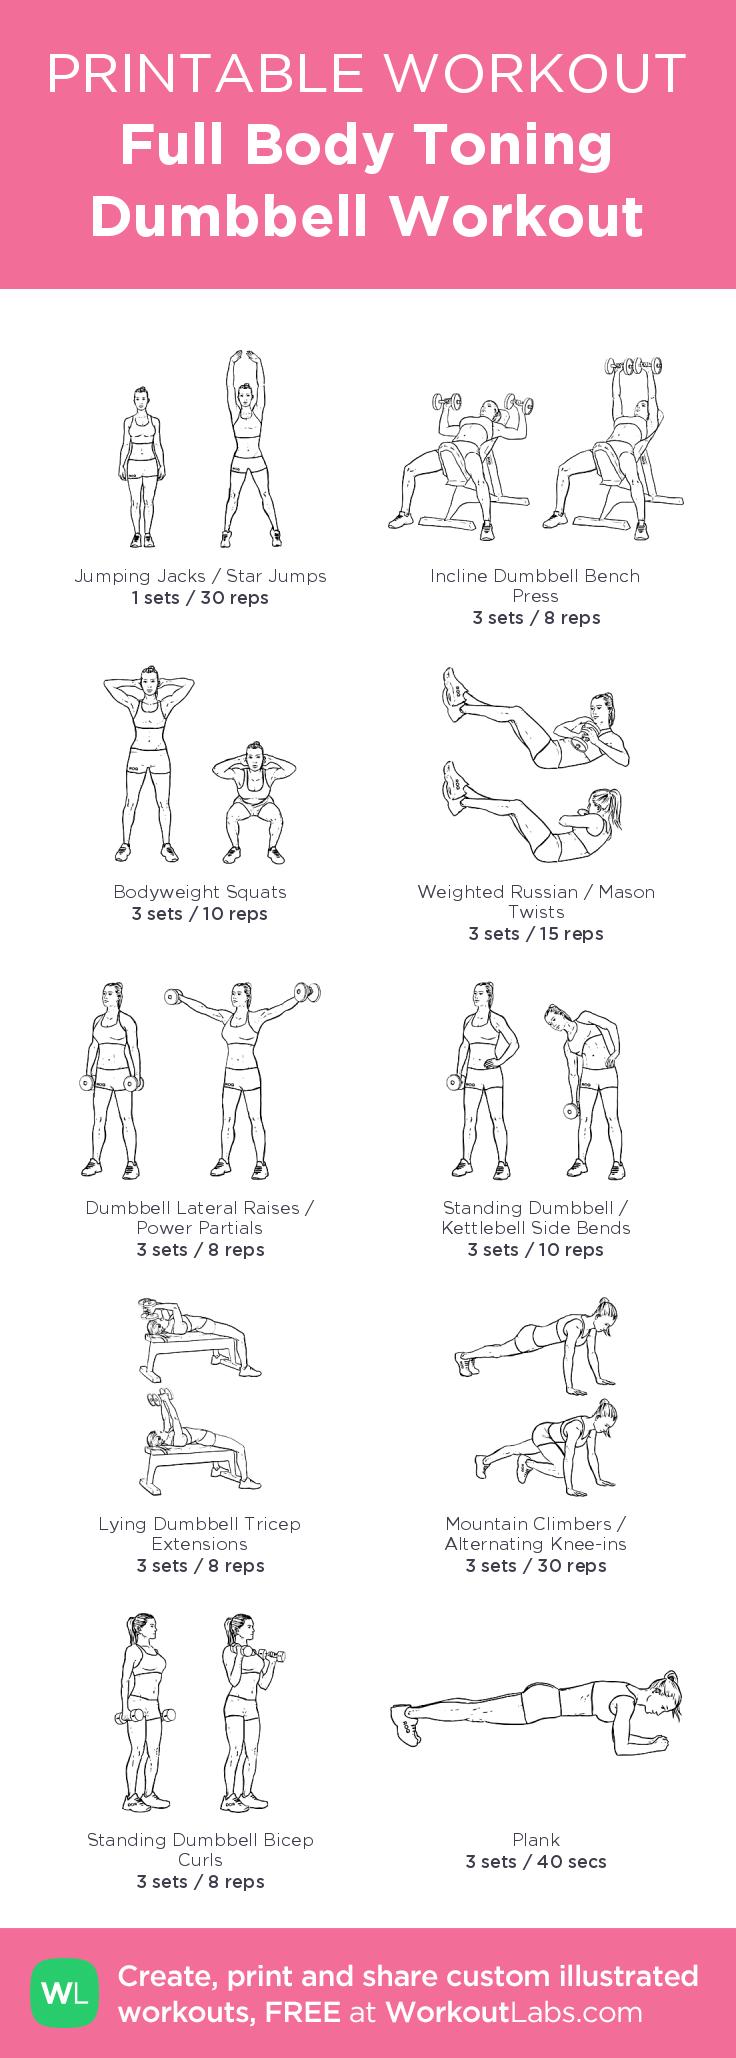 Pin On Exercising Printable Workouts